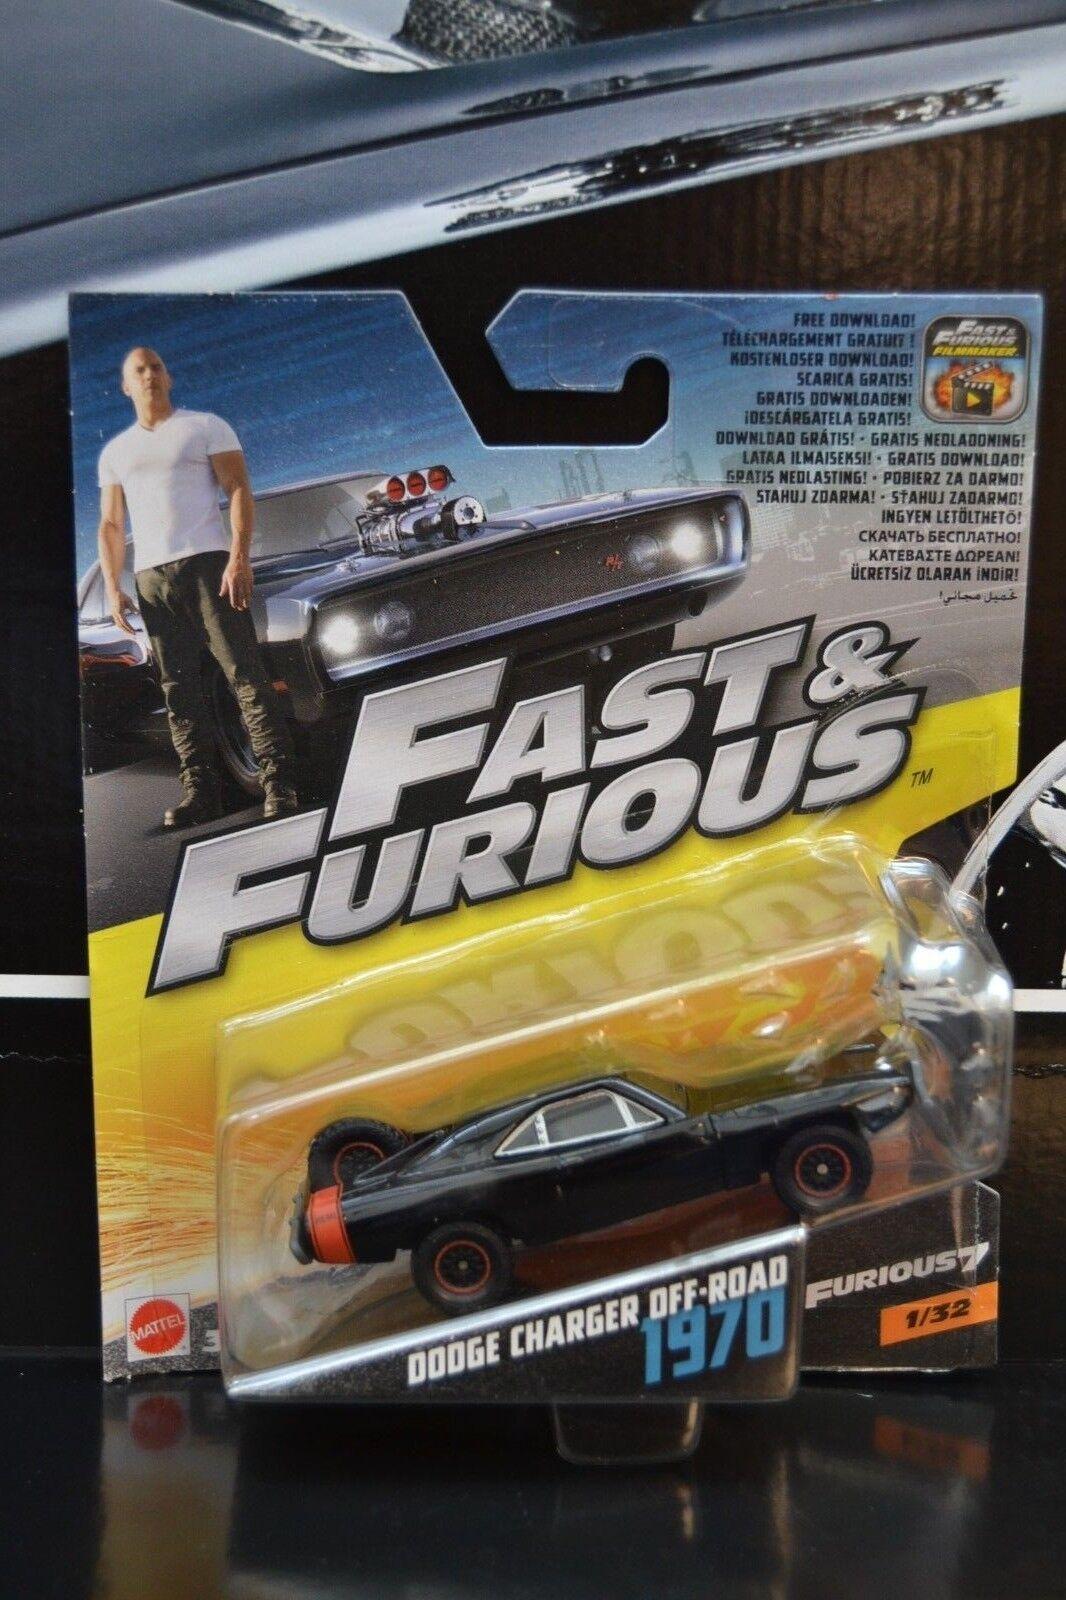 Furious 1970 Dodge Charger  Off Road 1:55  Neu /& OVP Mattel Fast u